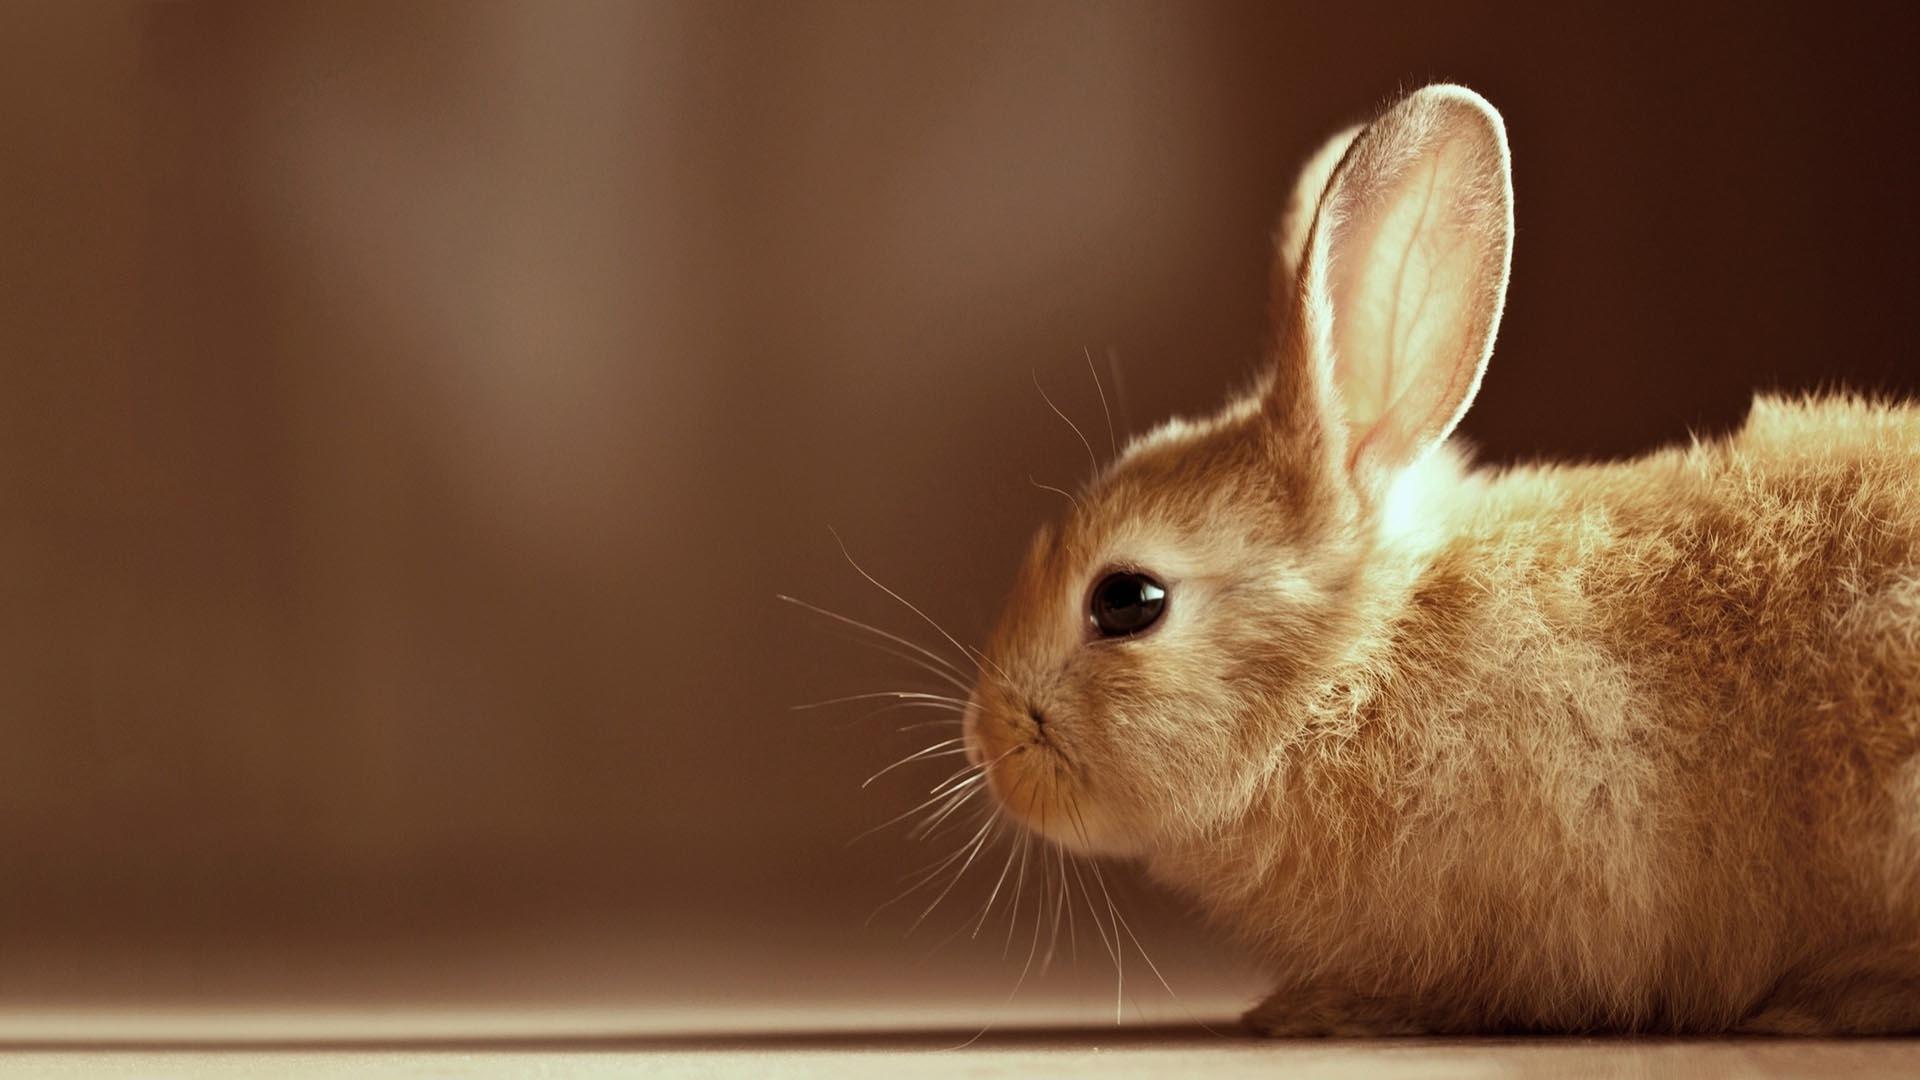 cute bunny wallpapers - wallpaper cave